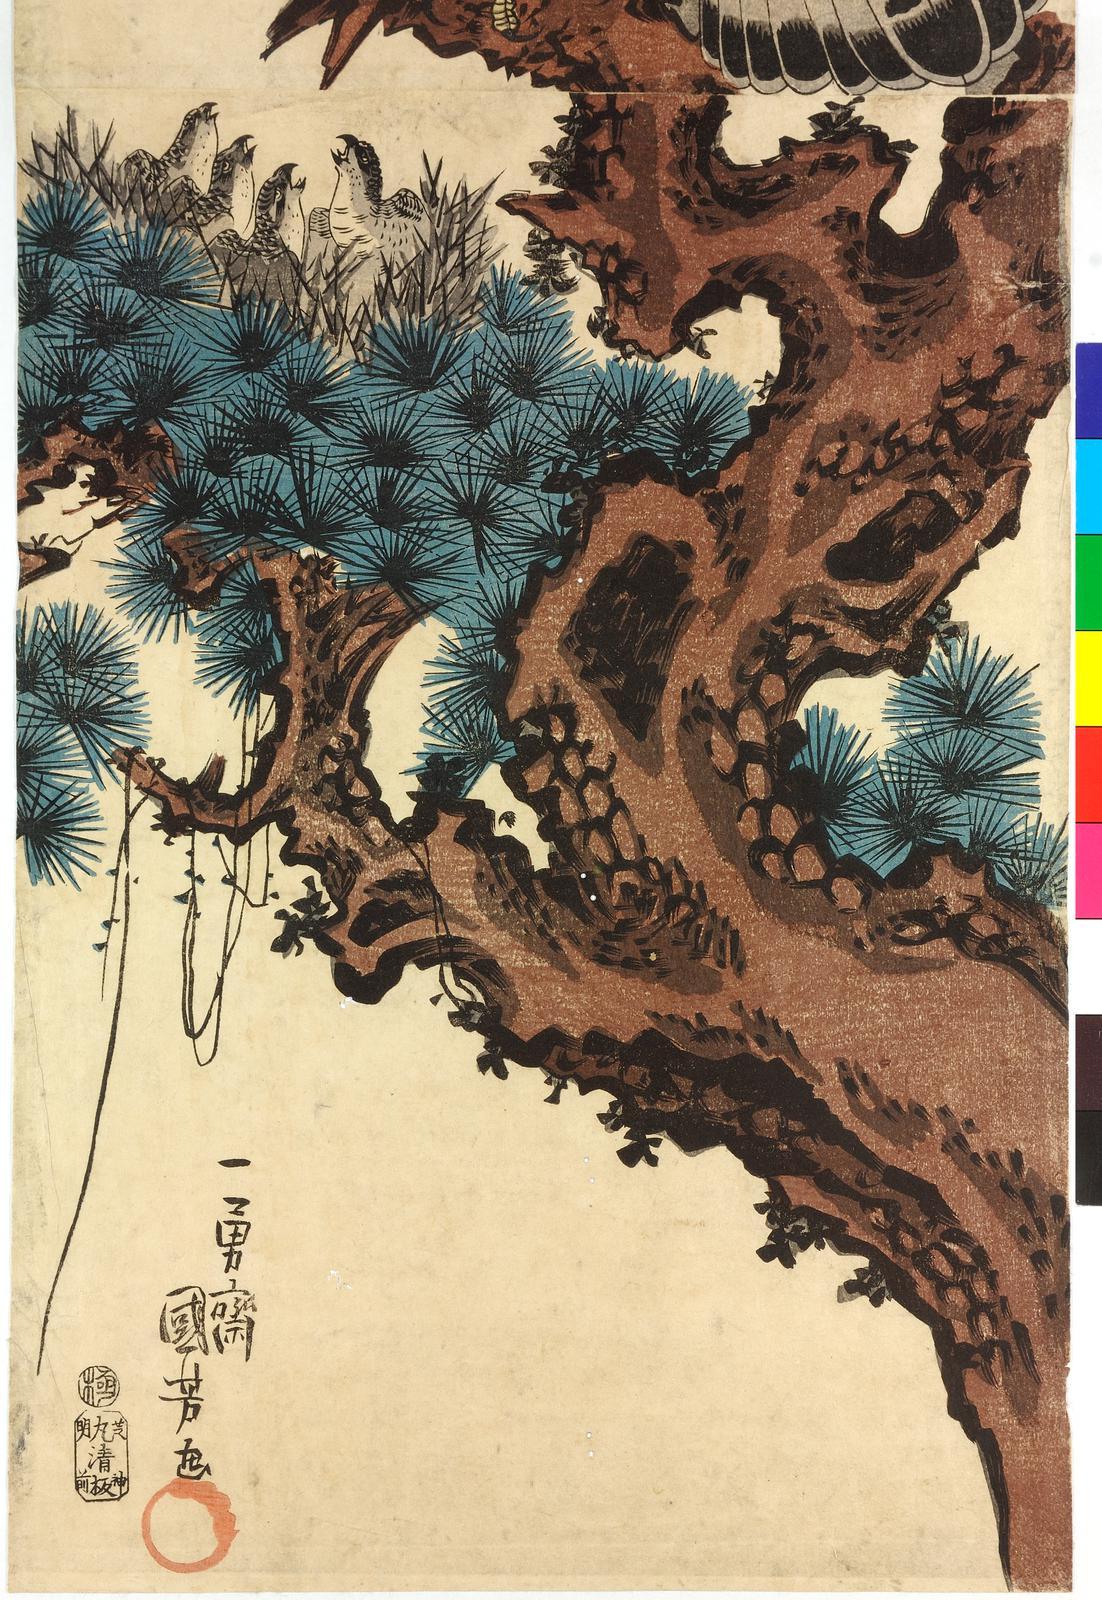 File:Diptych print (BM 1902,0606,0.132 1).jpg - Wikimedia